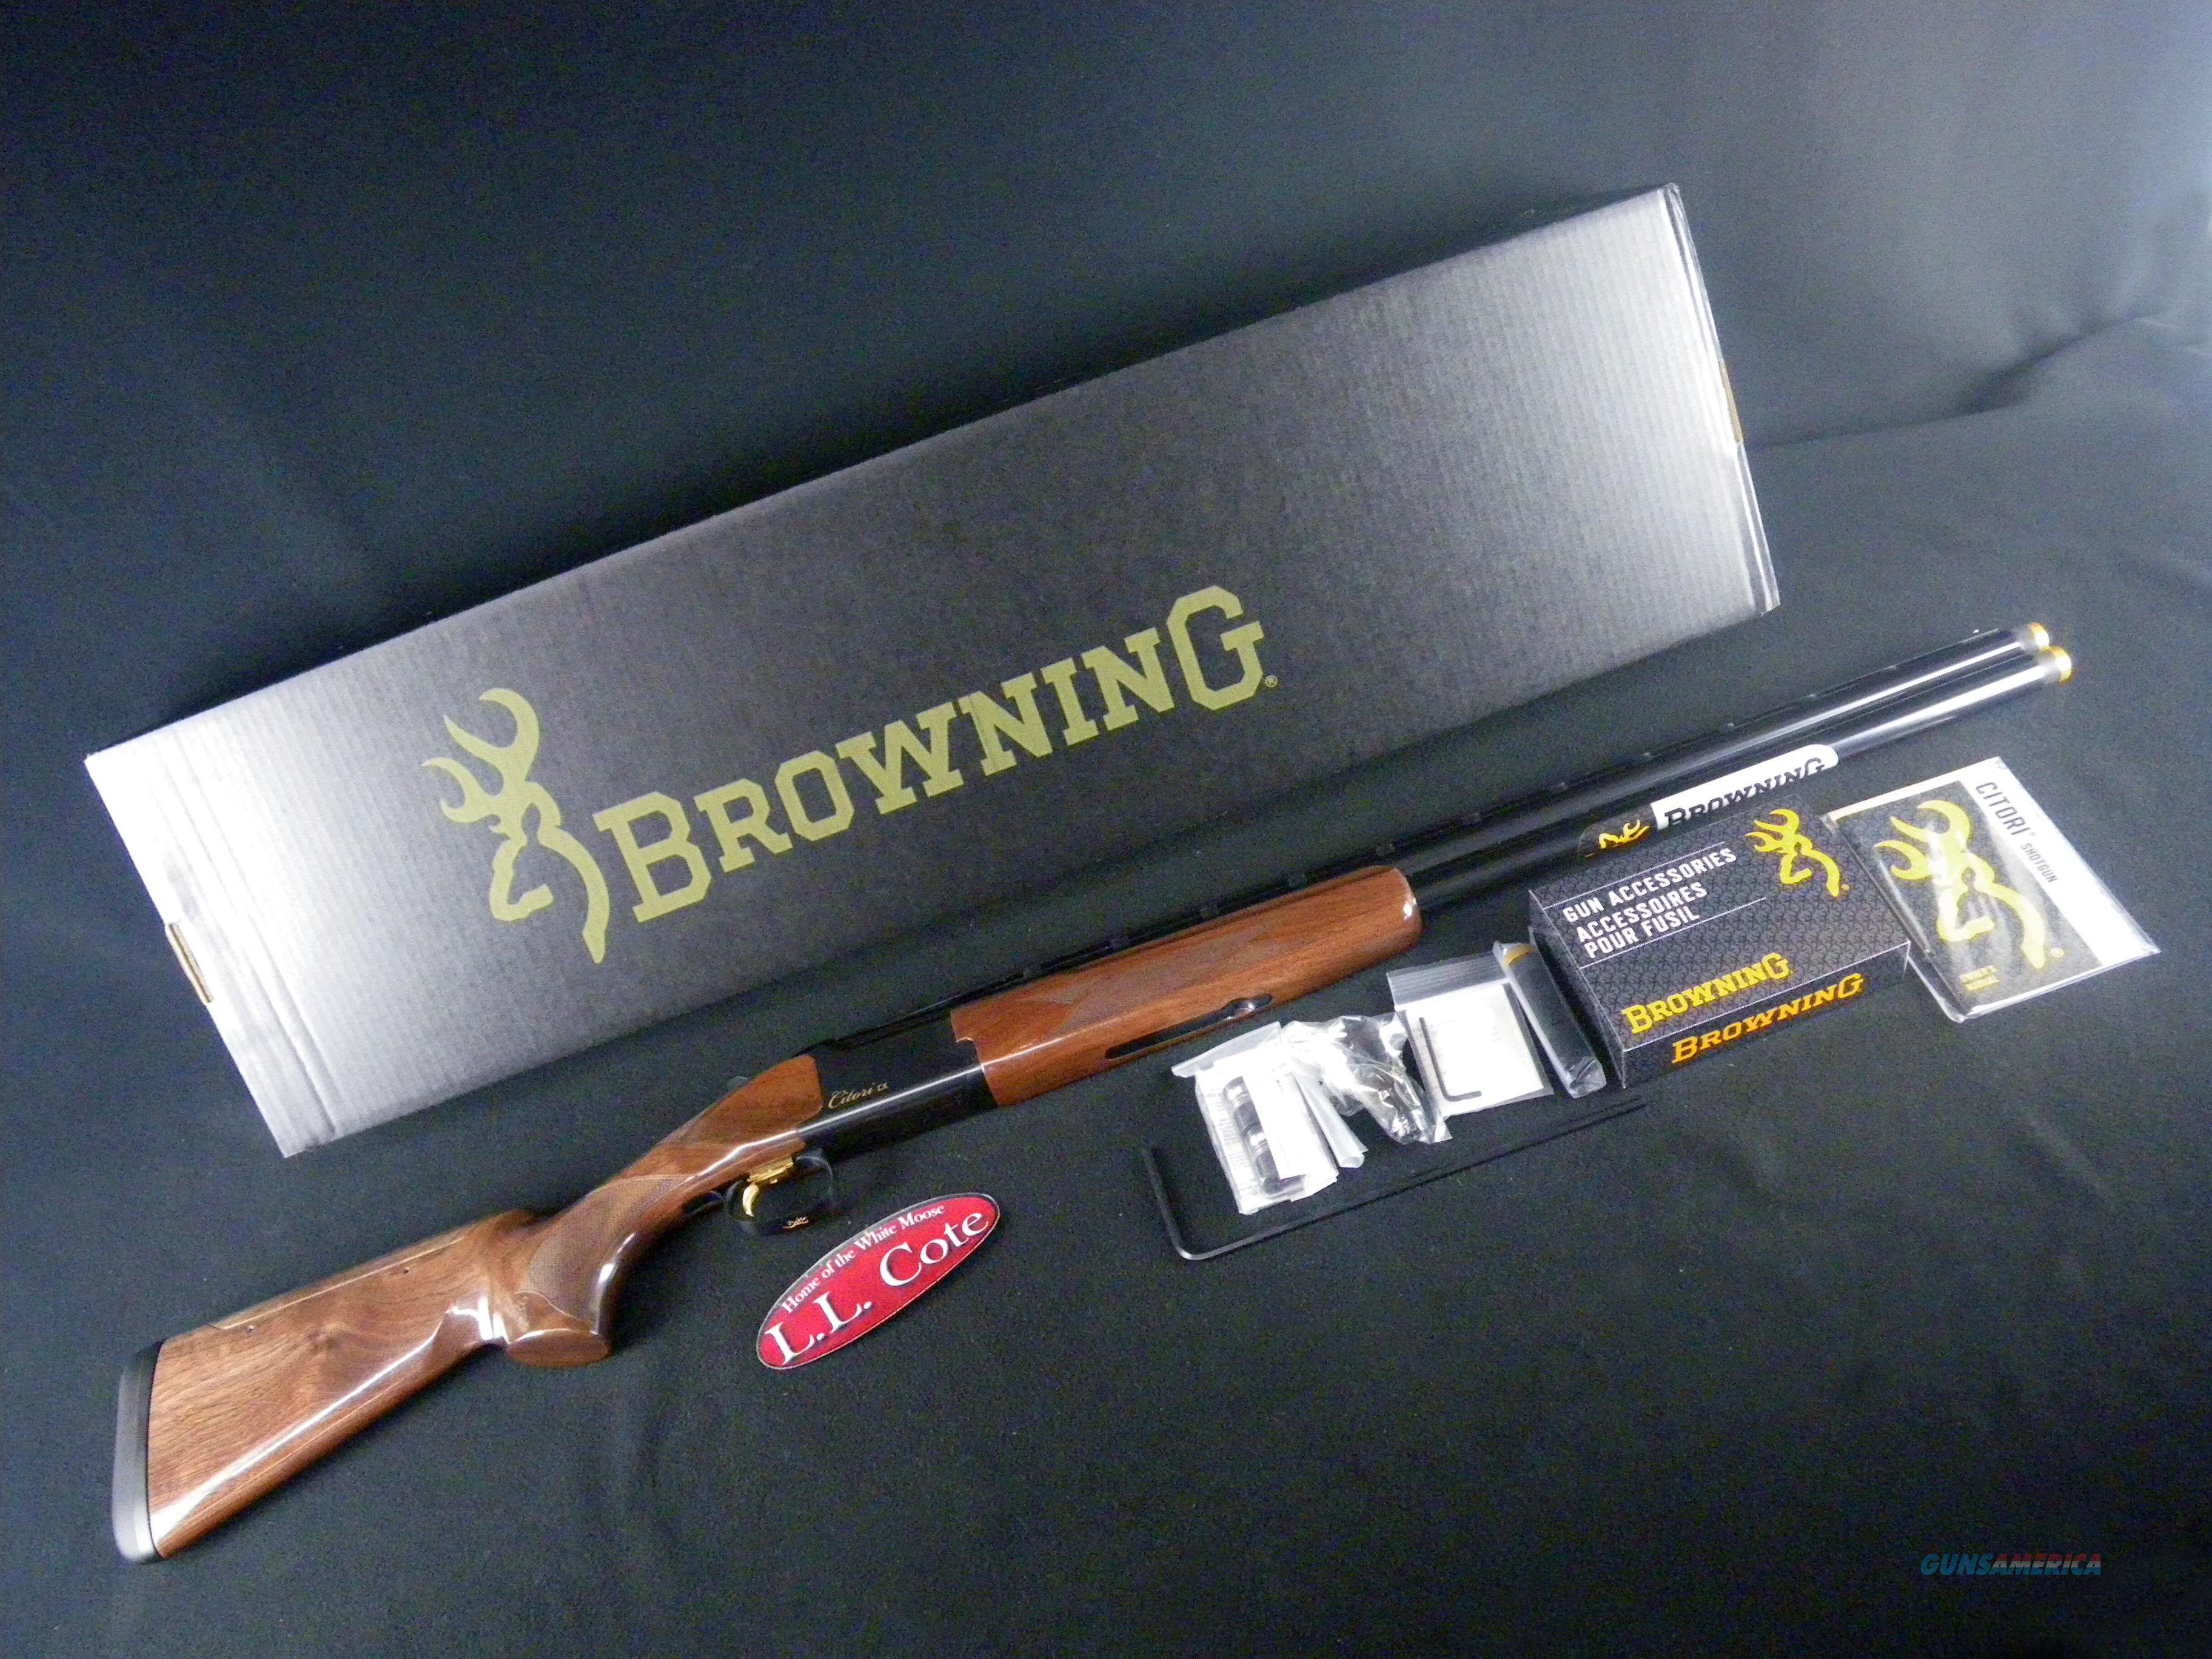 "Browning Citori CX Adj 12ga 28"" NEW 3"" 018111304  Guns > Shotguns > Browning Shotguns > Over Unders > Citori > Hunting"